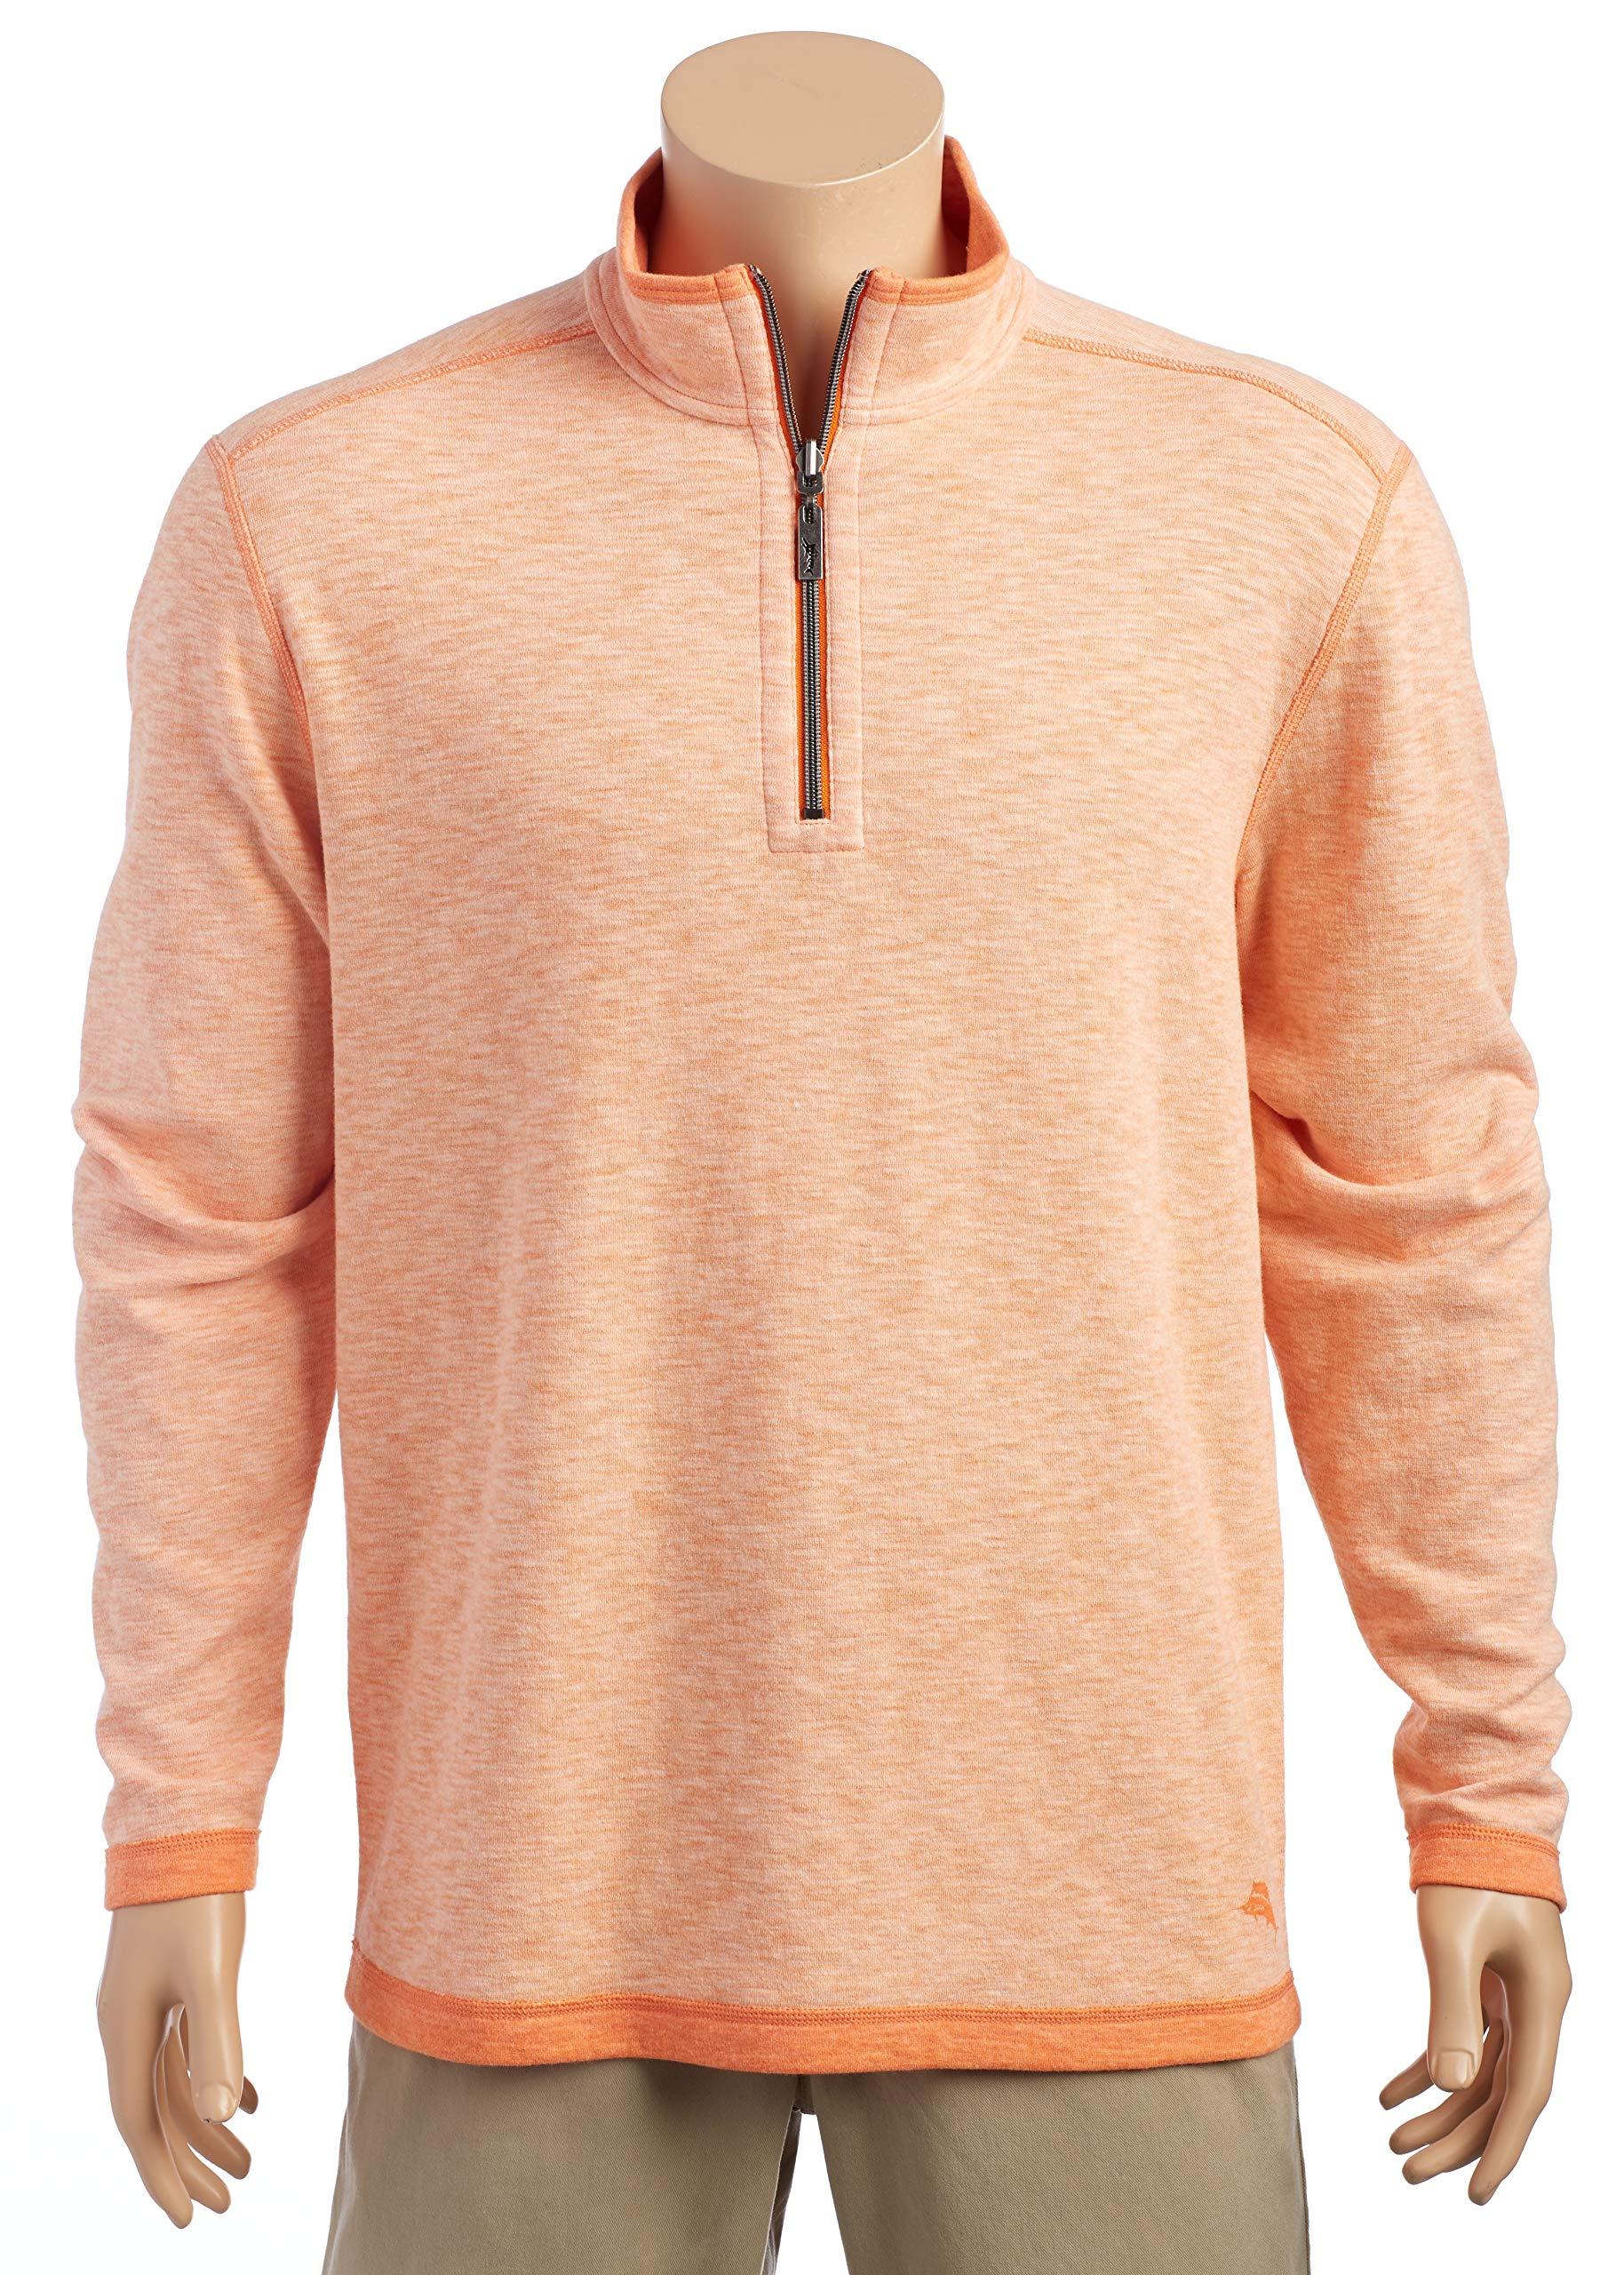 Tommy Bahama Sea Glass Reversible Half-Zip Sweatshirt (Curuba, L)